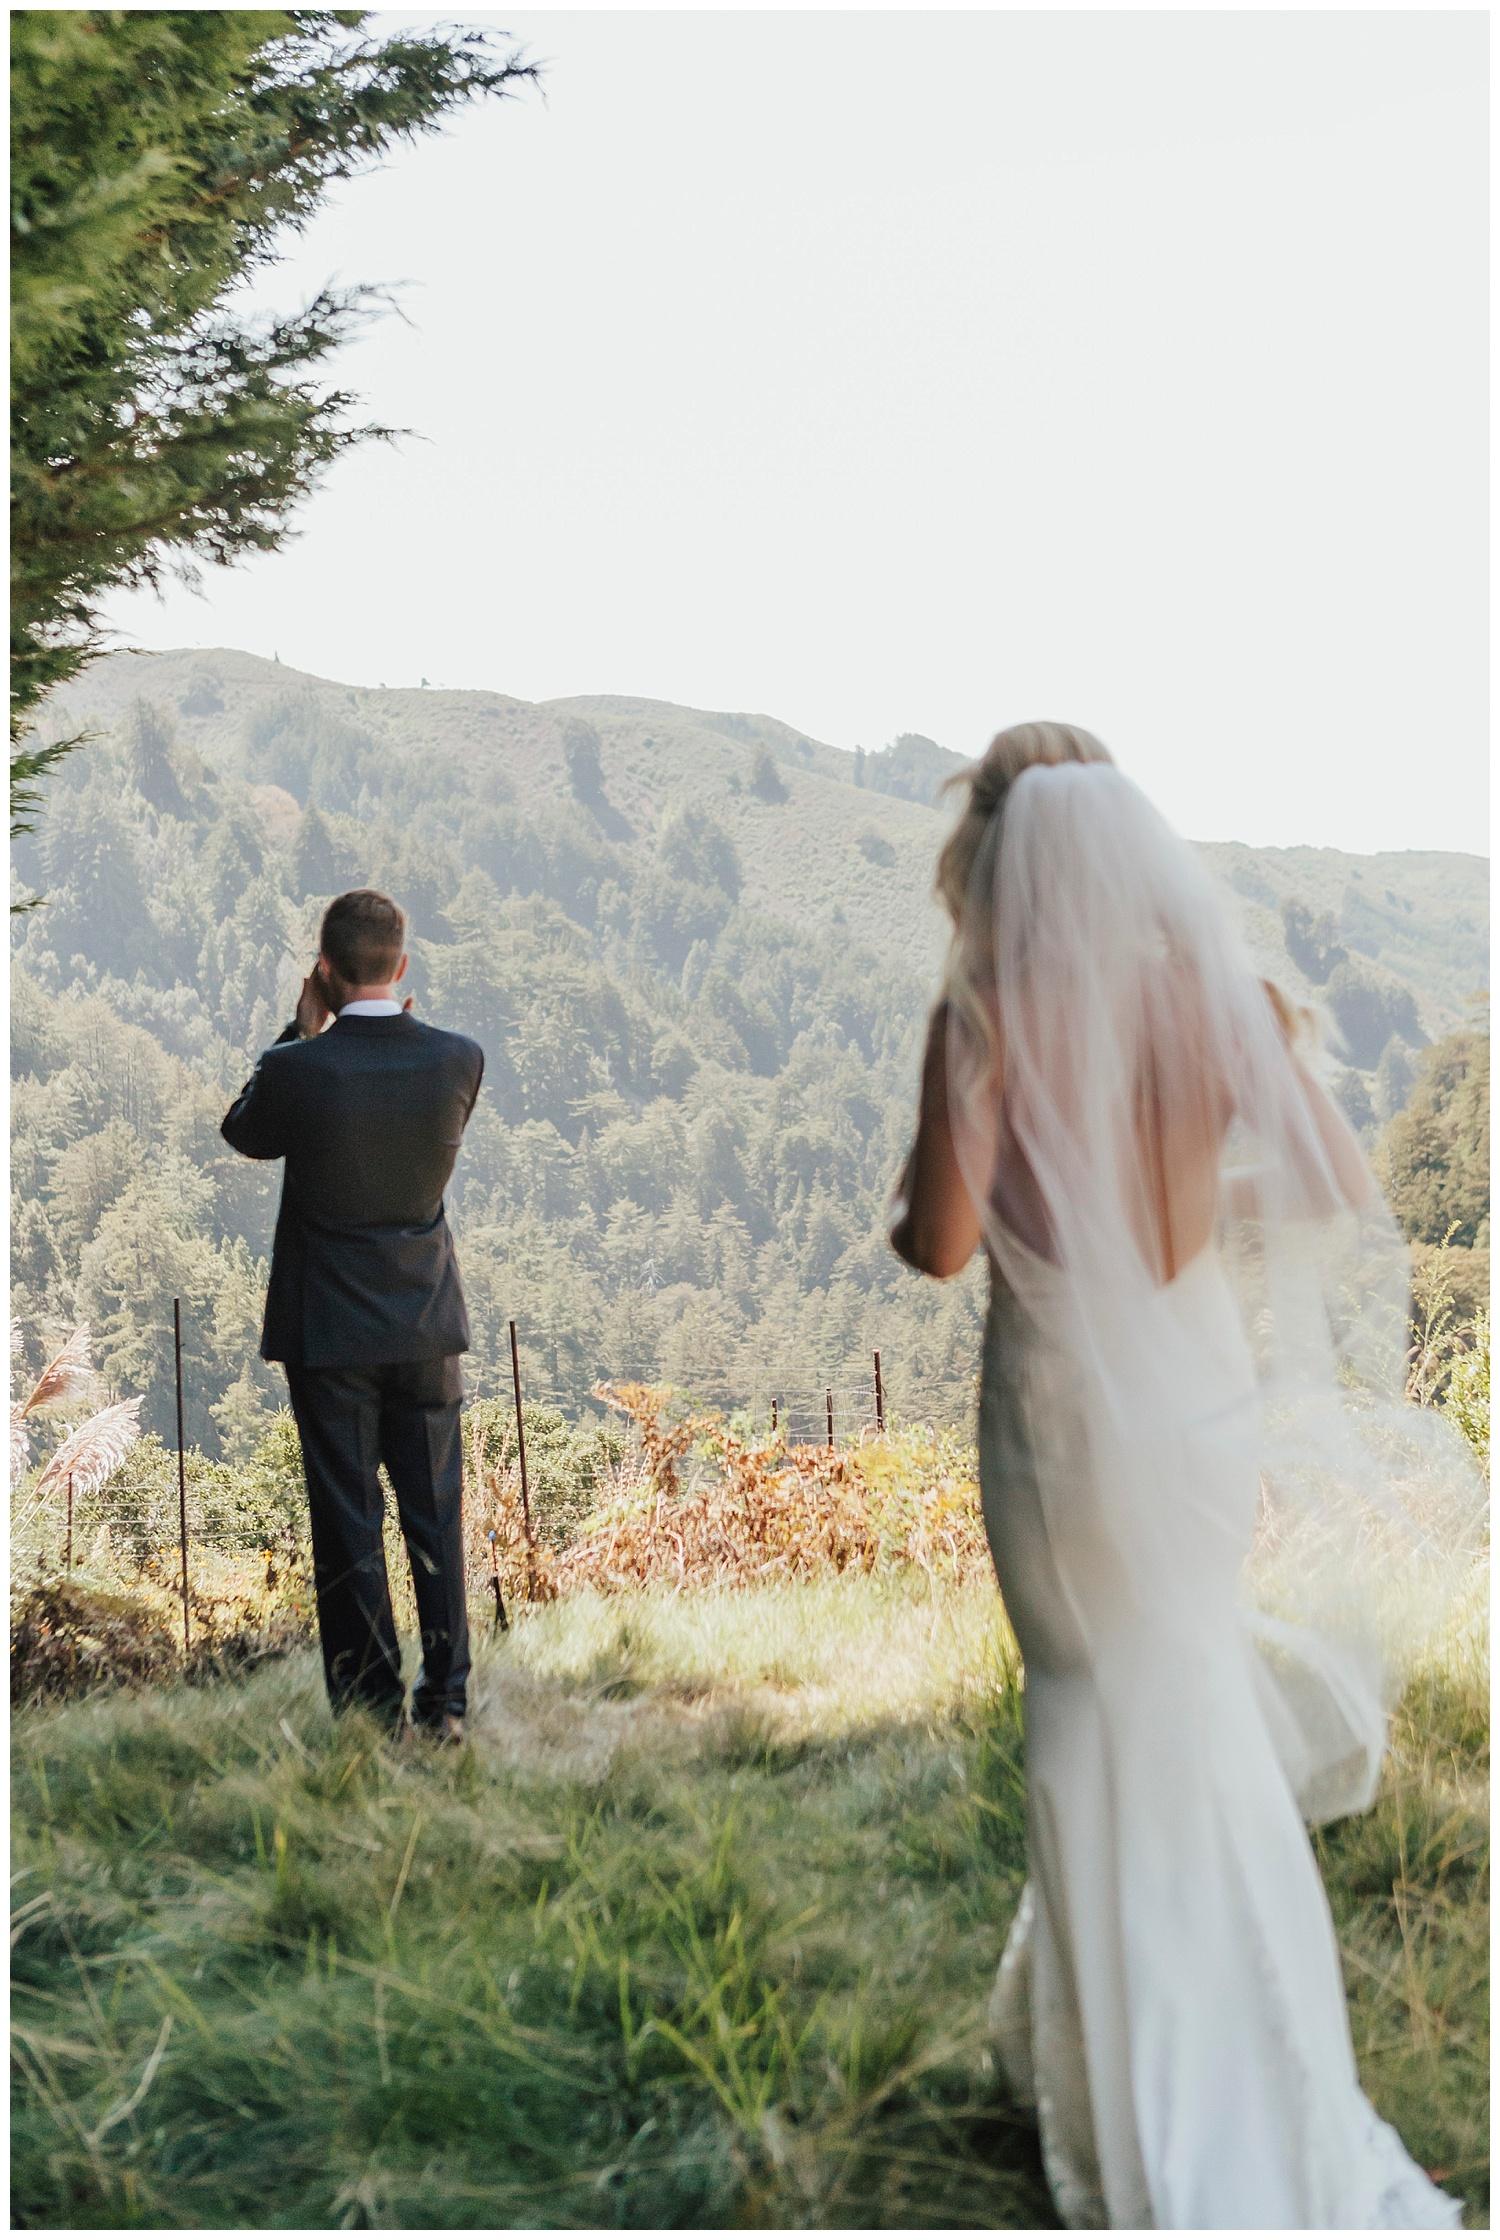 big-sur-wedding-first-look-anticipation-carol-oliva-photography.jpg